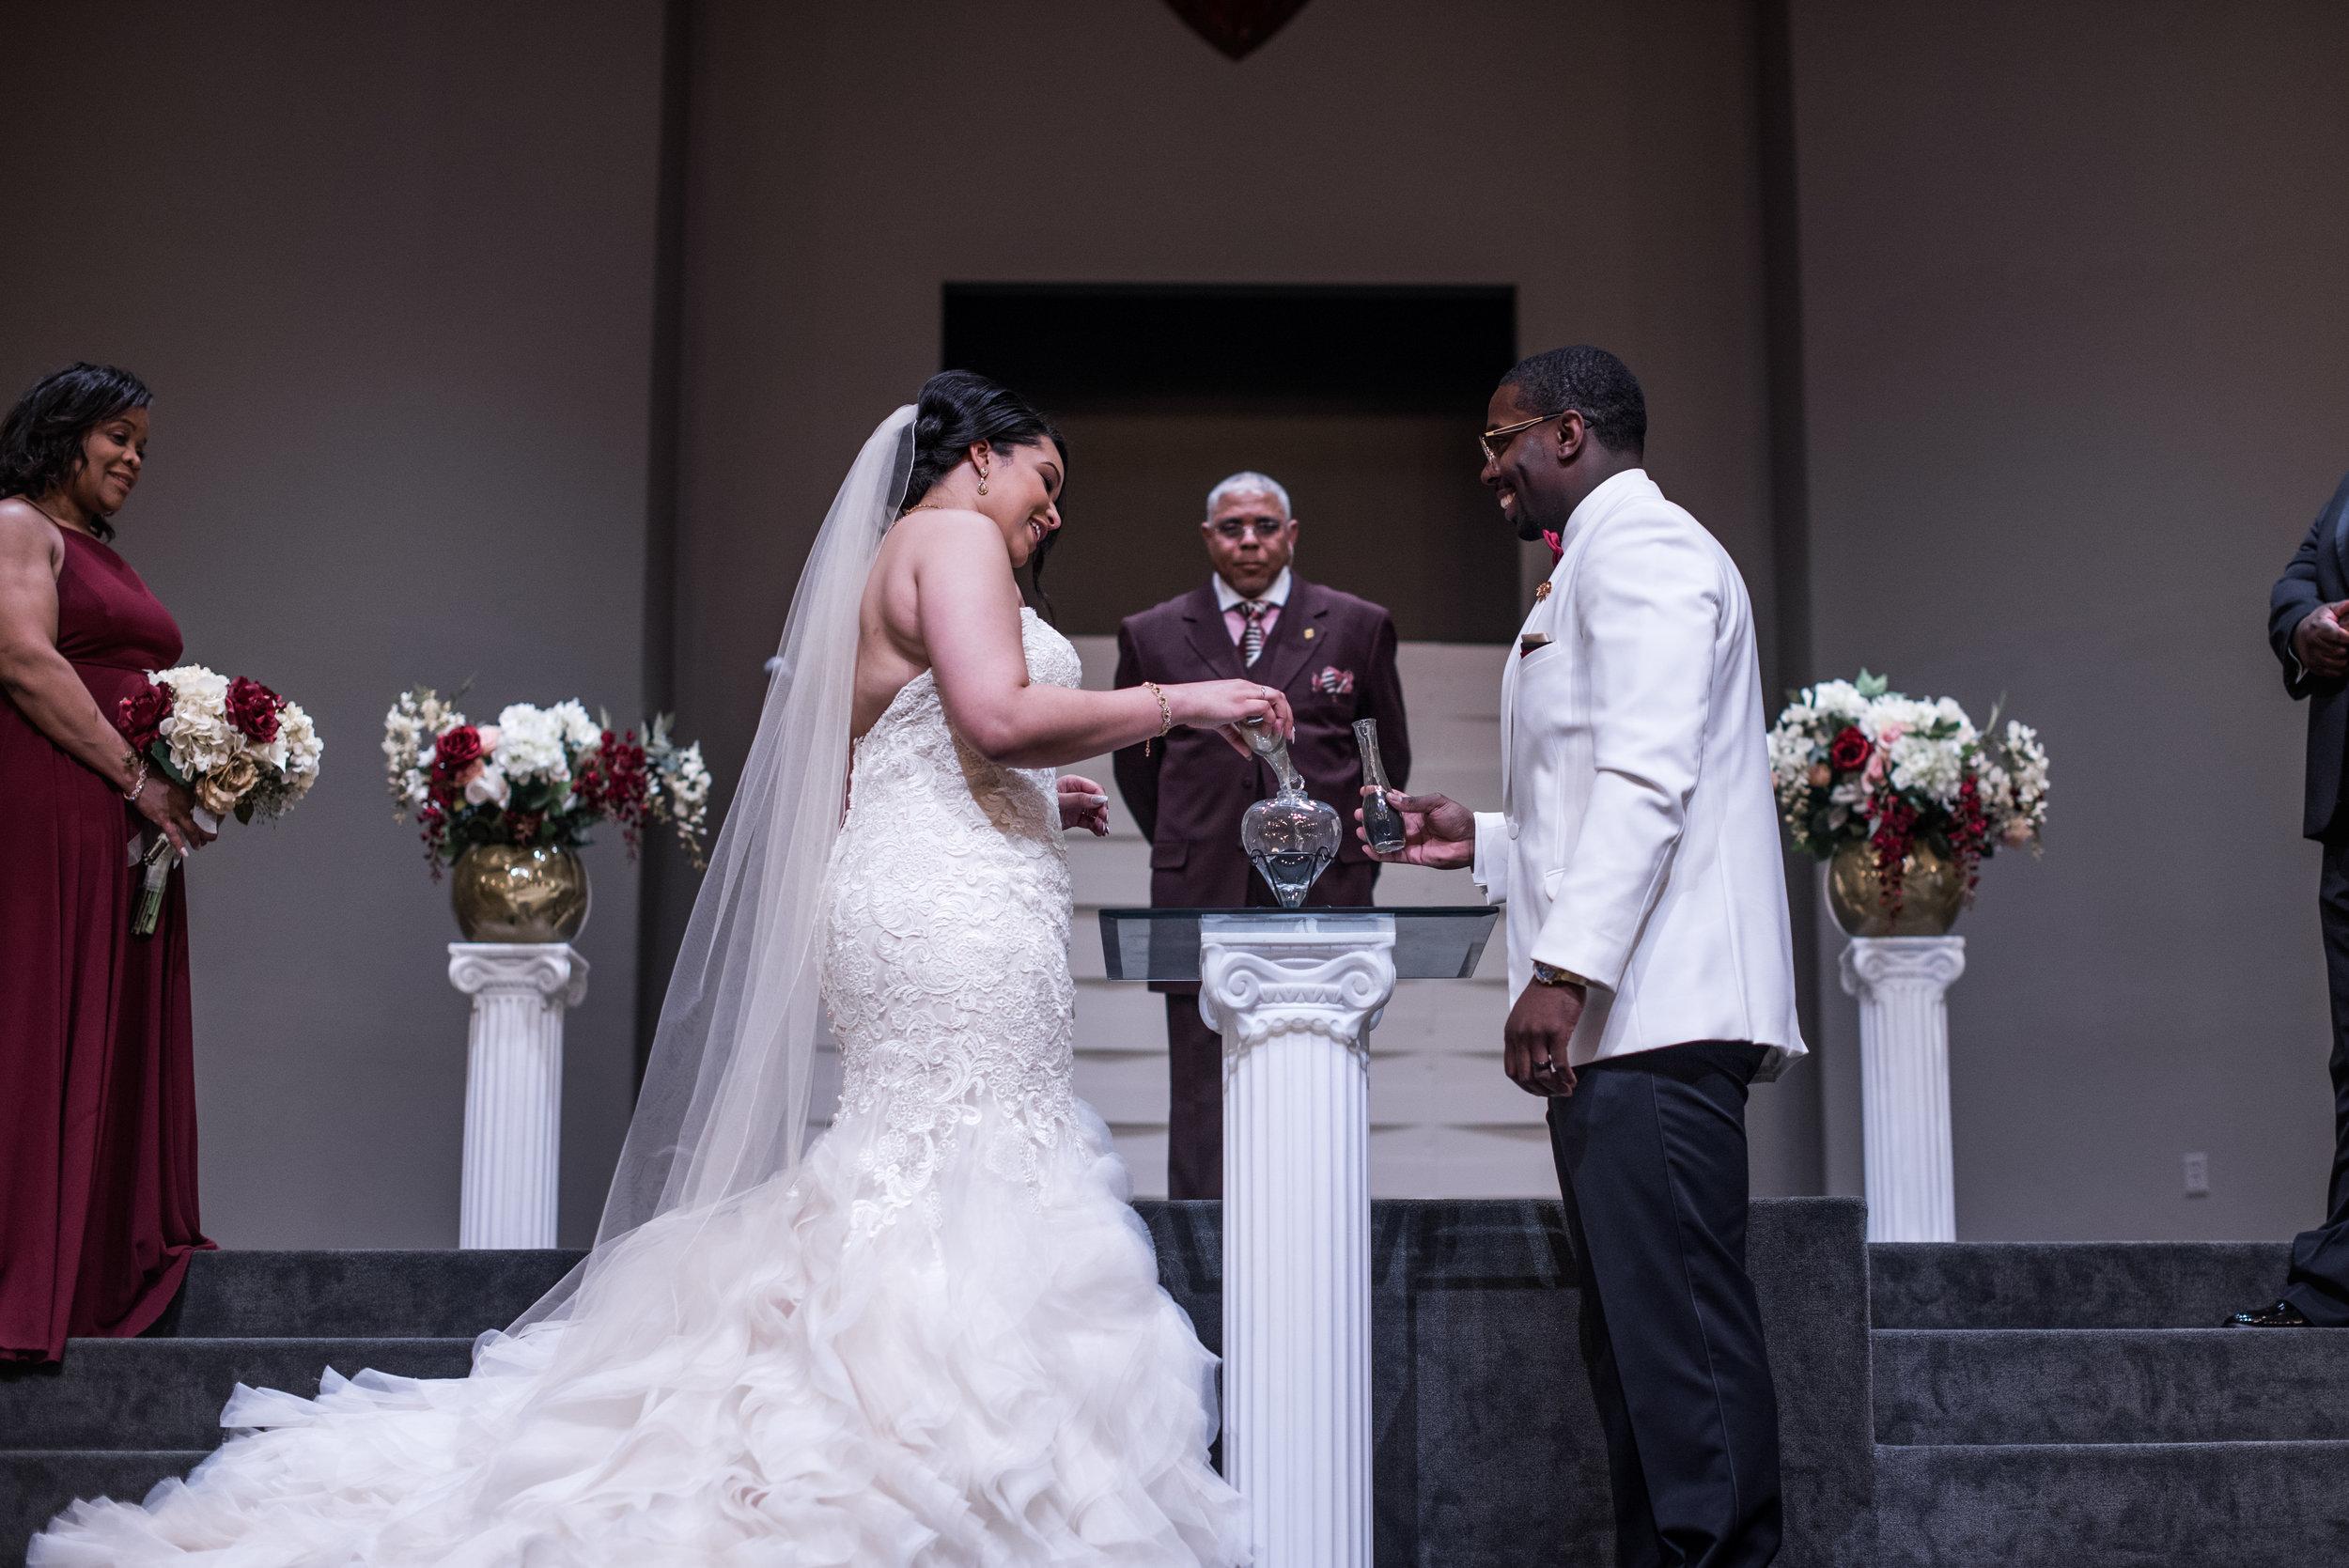 Burlington Iowa Wedding Midwest Photographer Melissa Cervantes _ Chantelle and Isaiah 552a.jpg